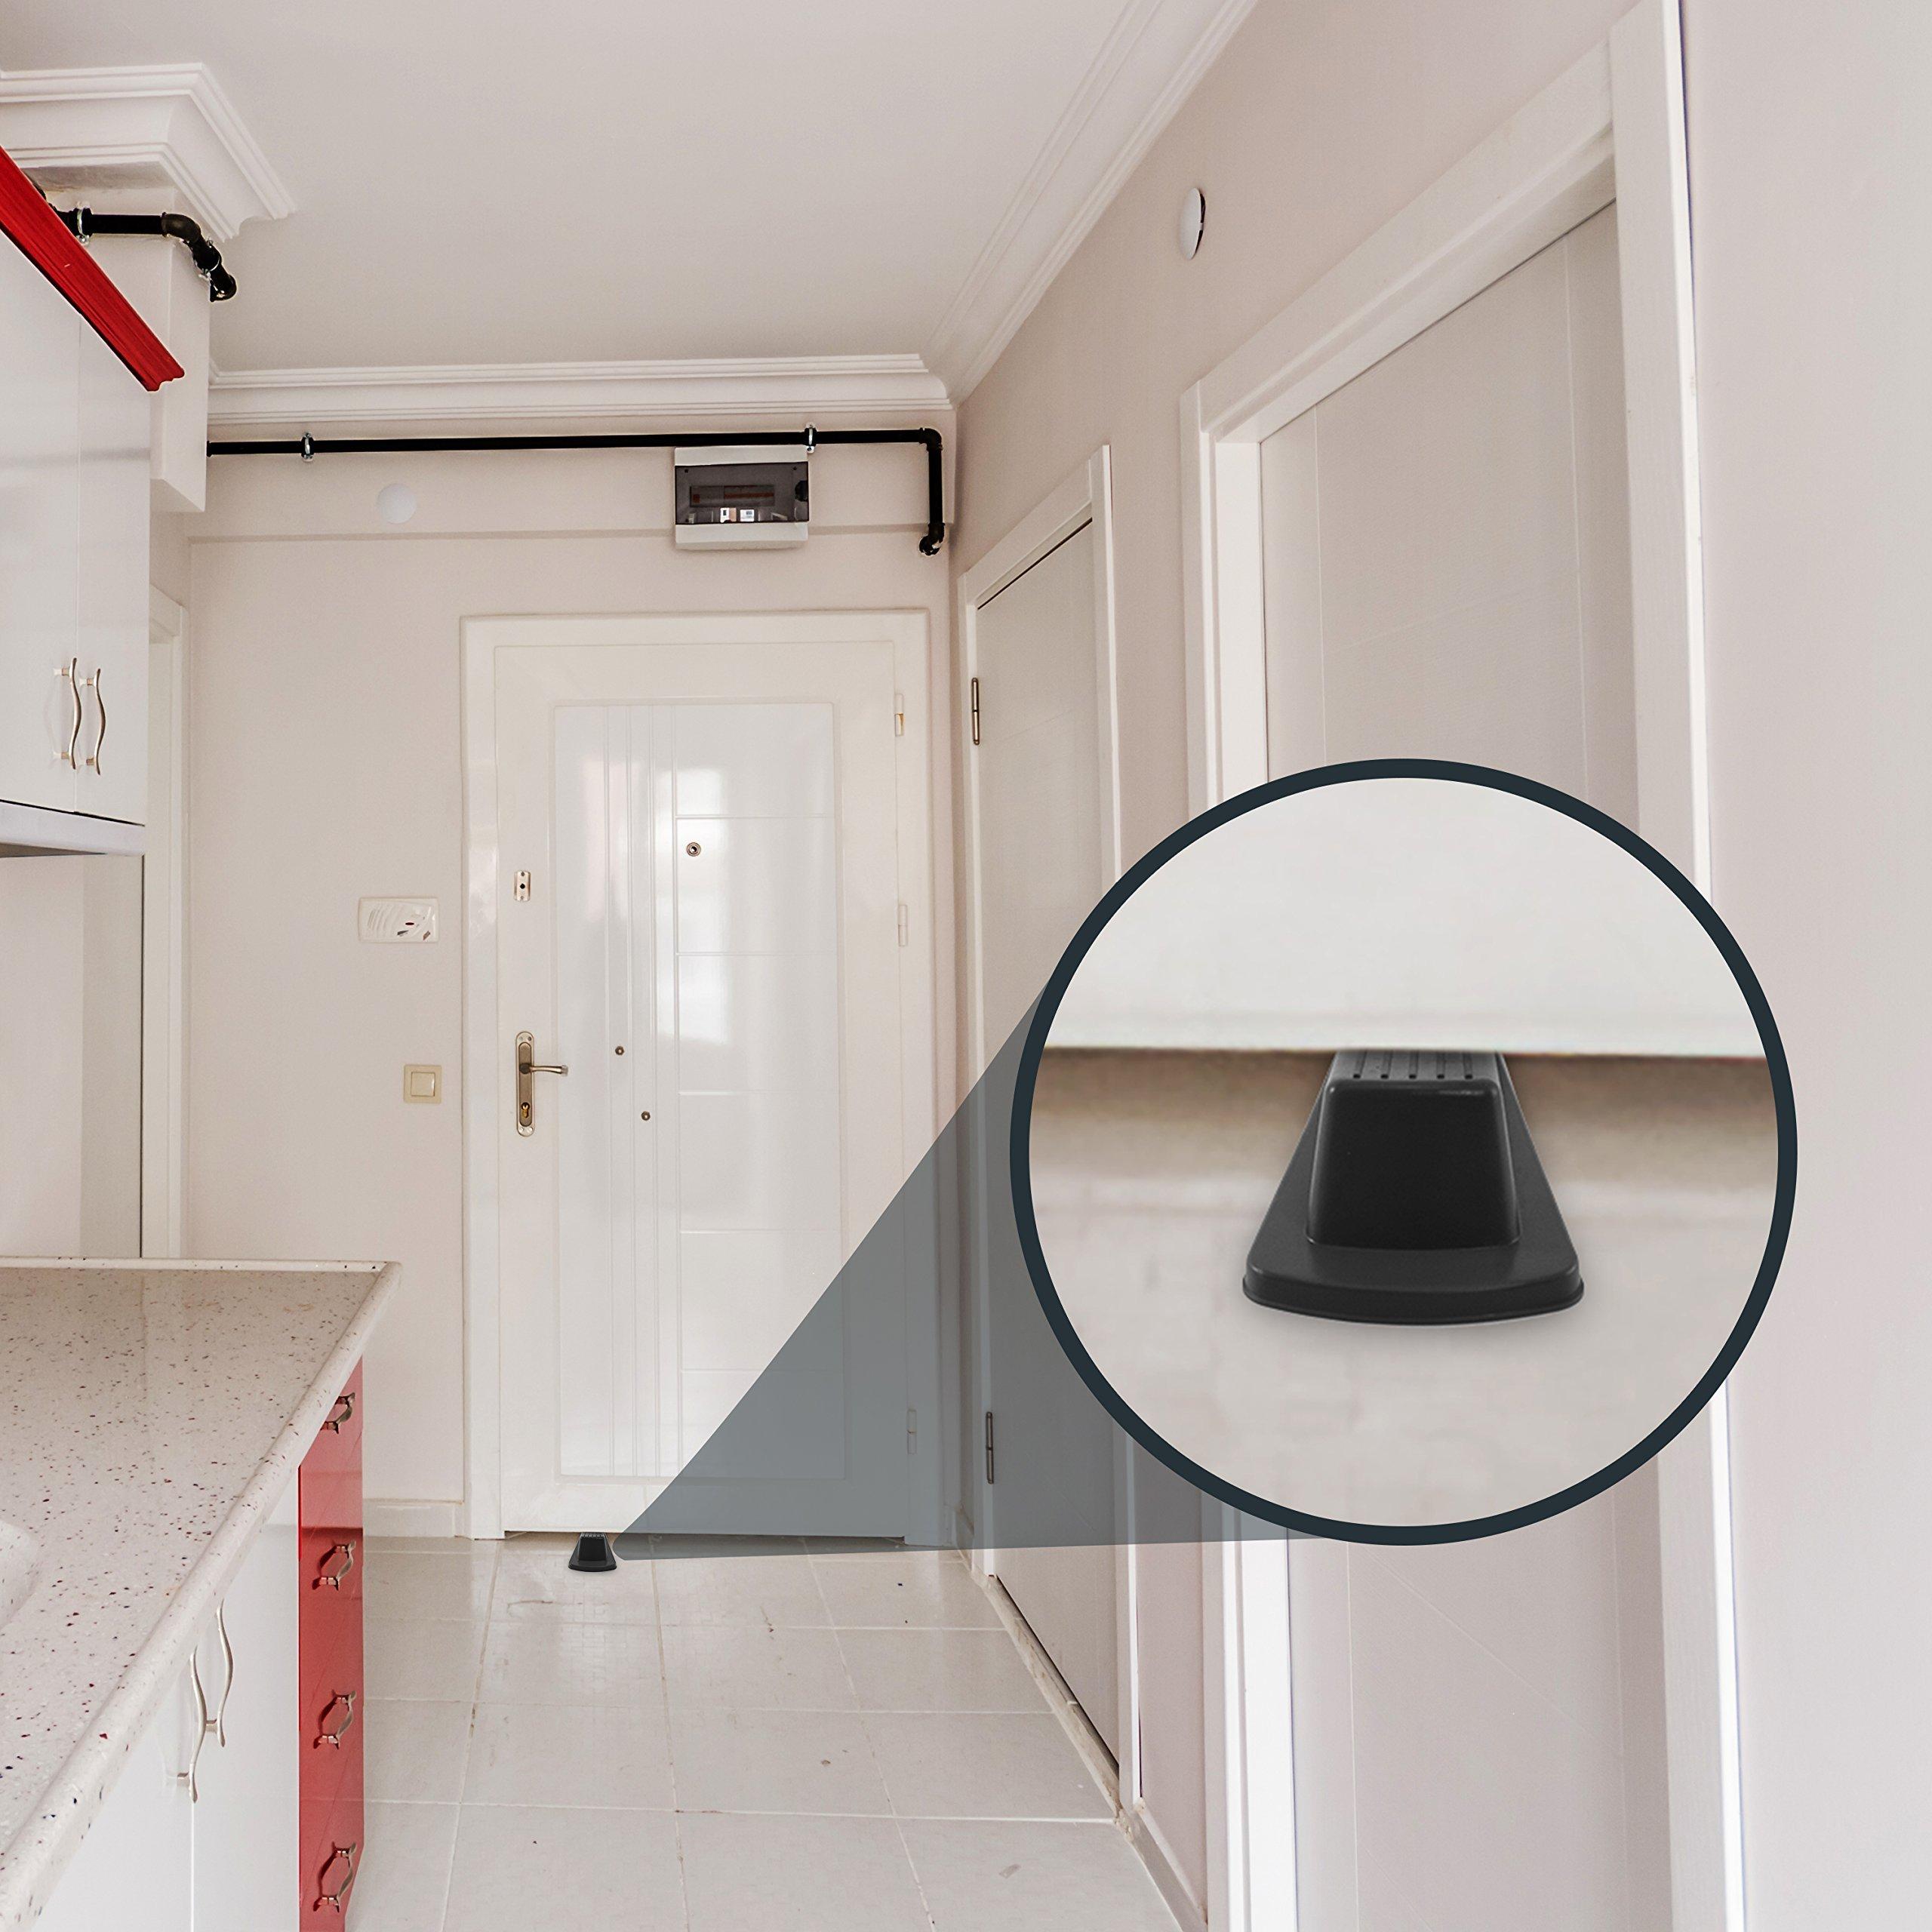 Home Premium Rubber Door Stop - Large Door Stopper Wedge, Multi Surface Design (4 Pack, Black) by HOME PREMIUM (Image #7)